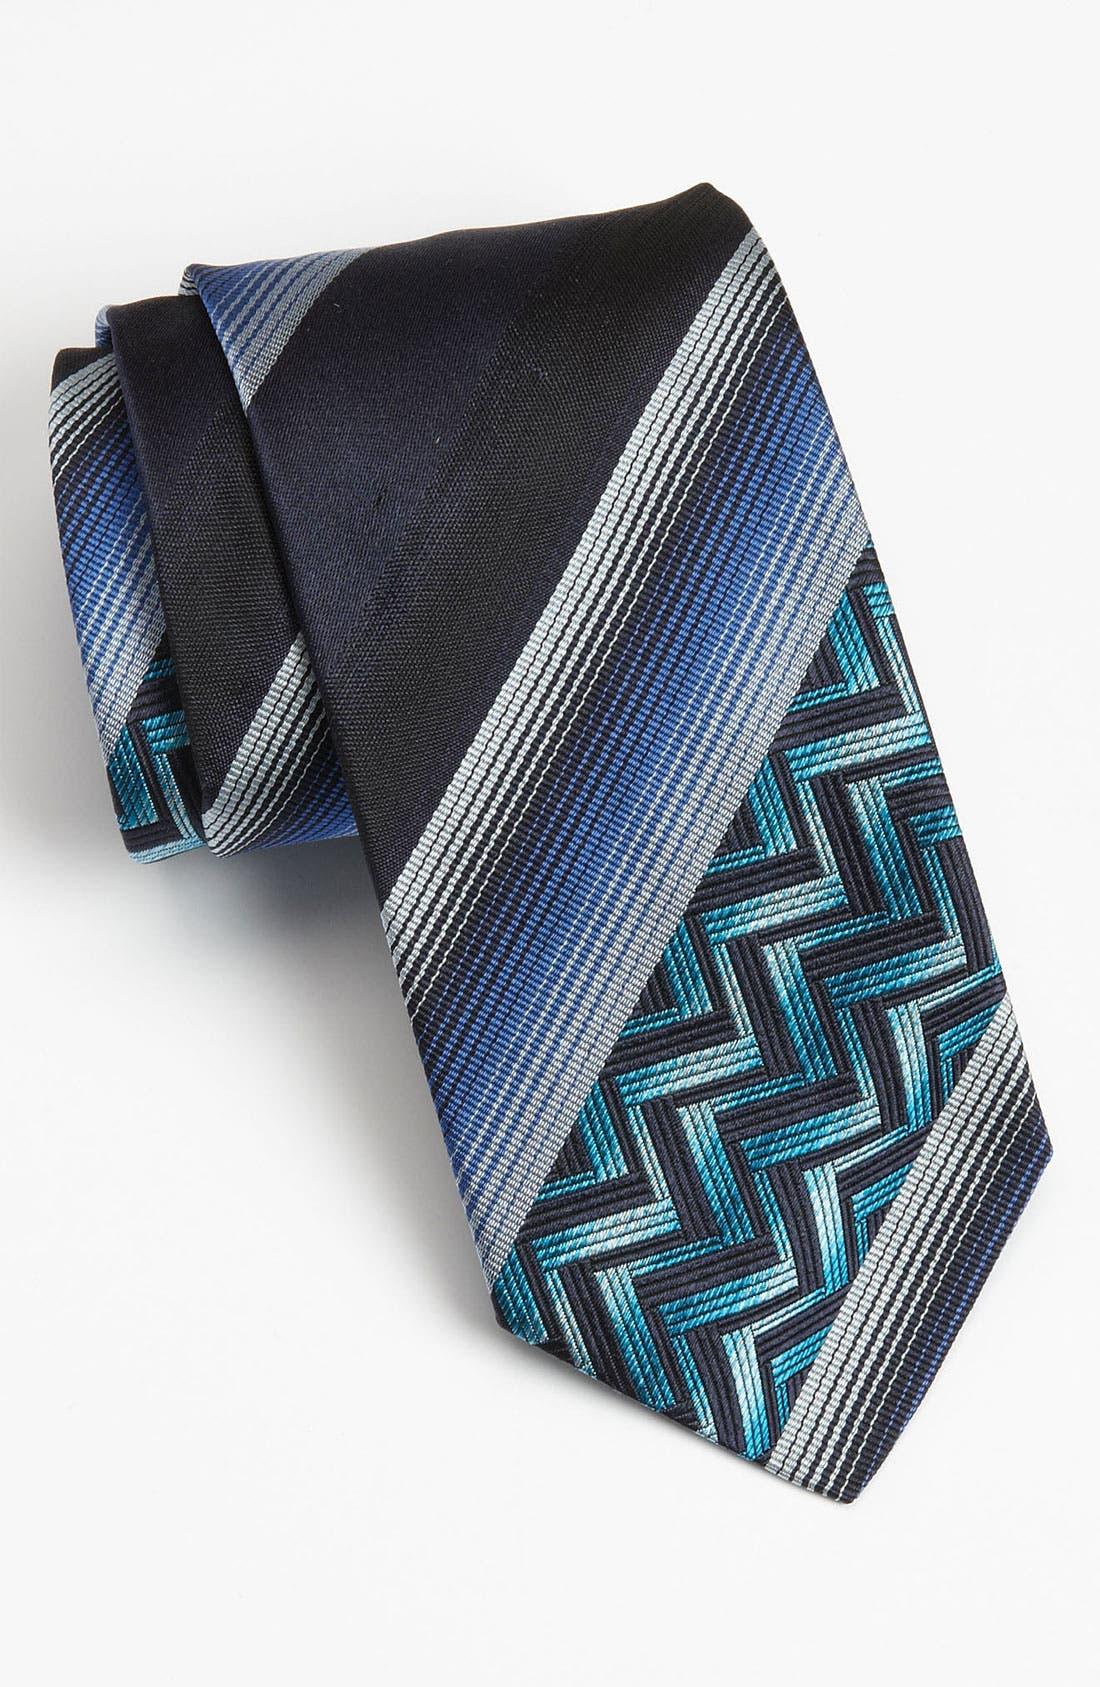 Alternate Image 1 Selected - Missoni Woven Silk Tie